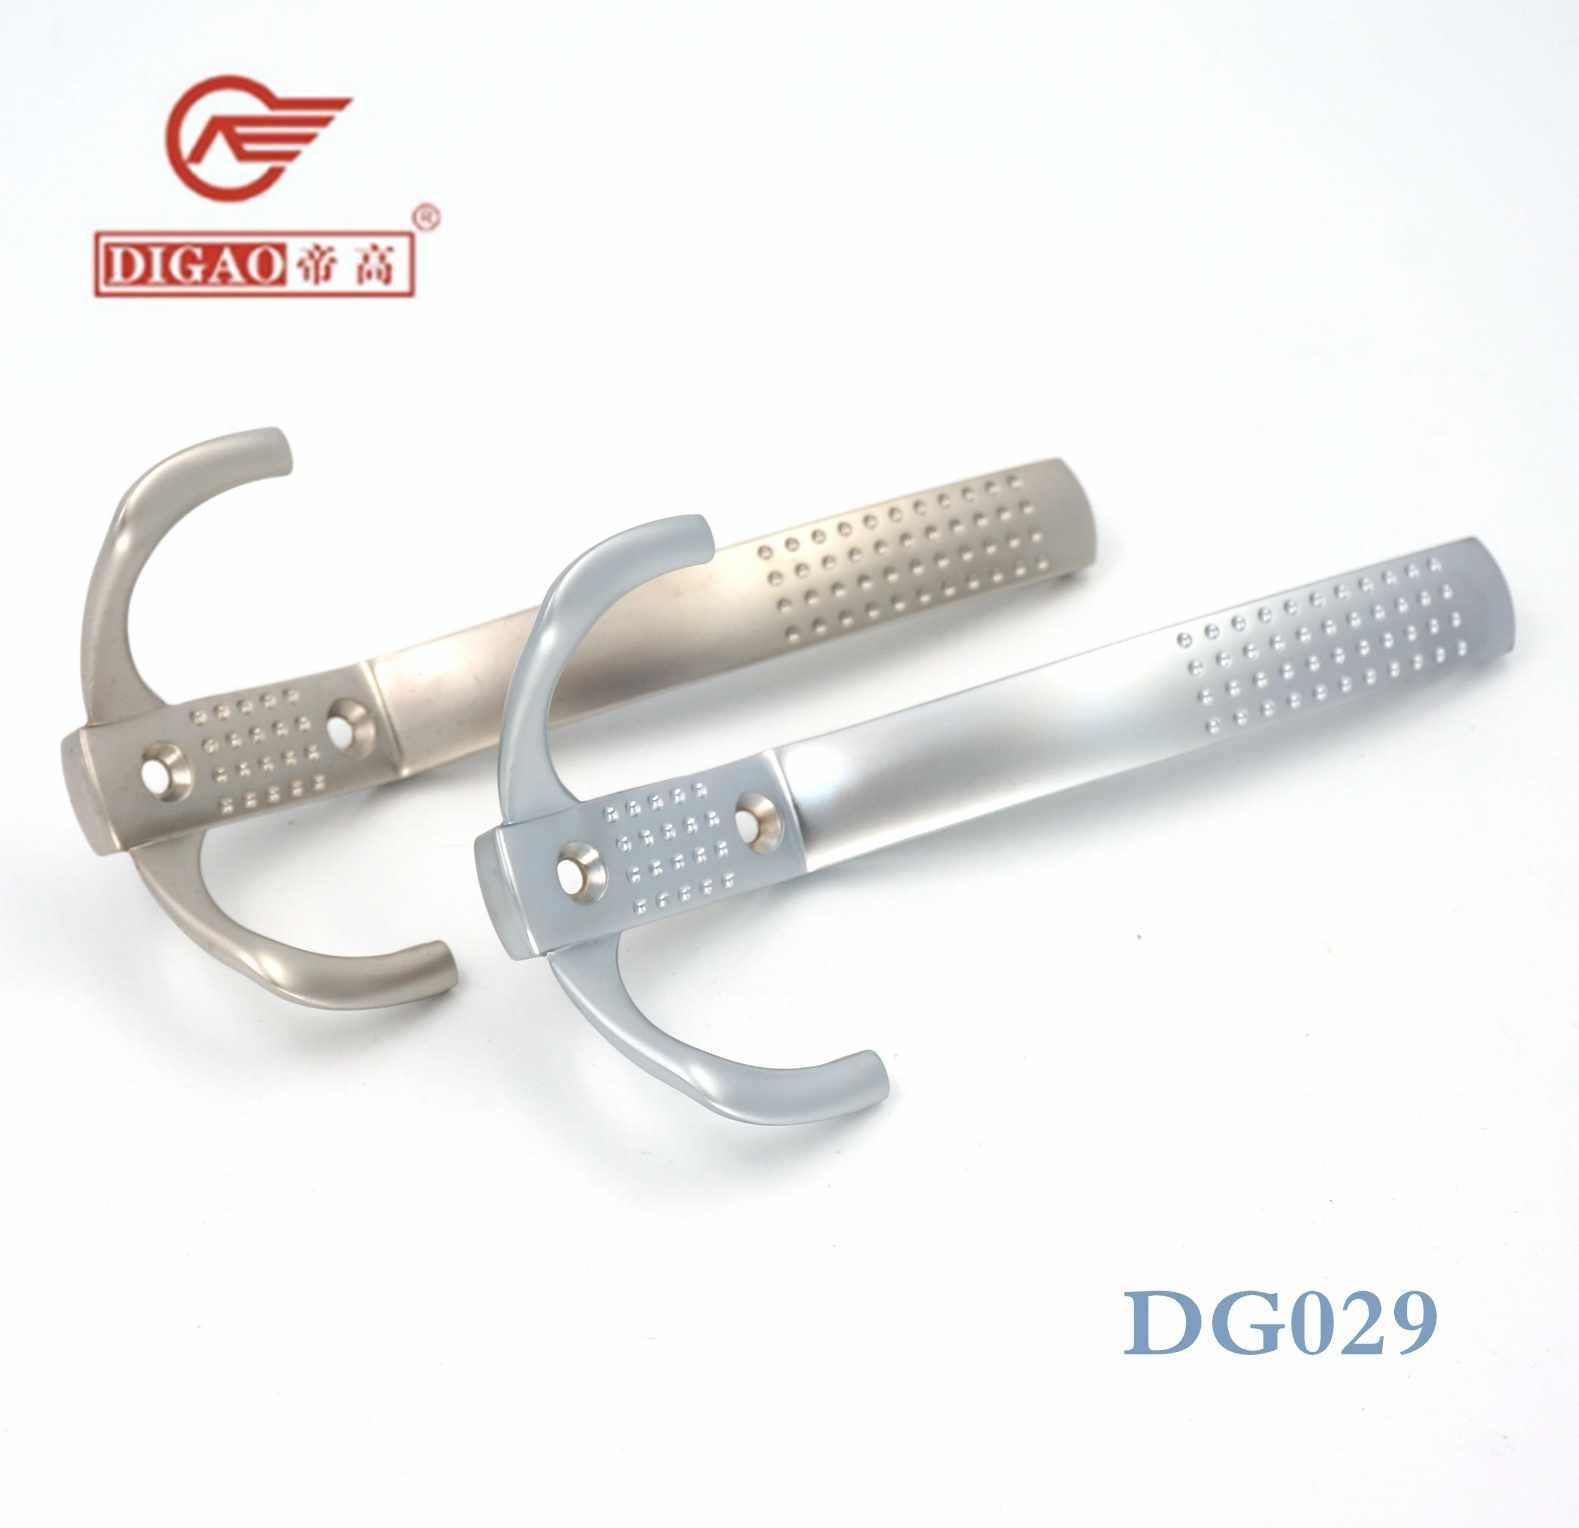 DG029